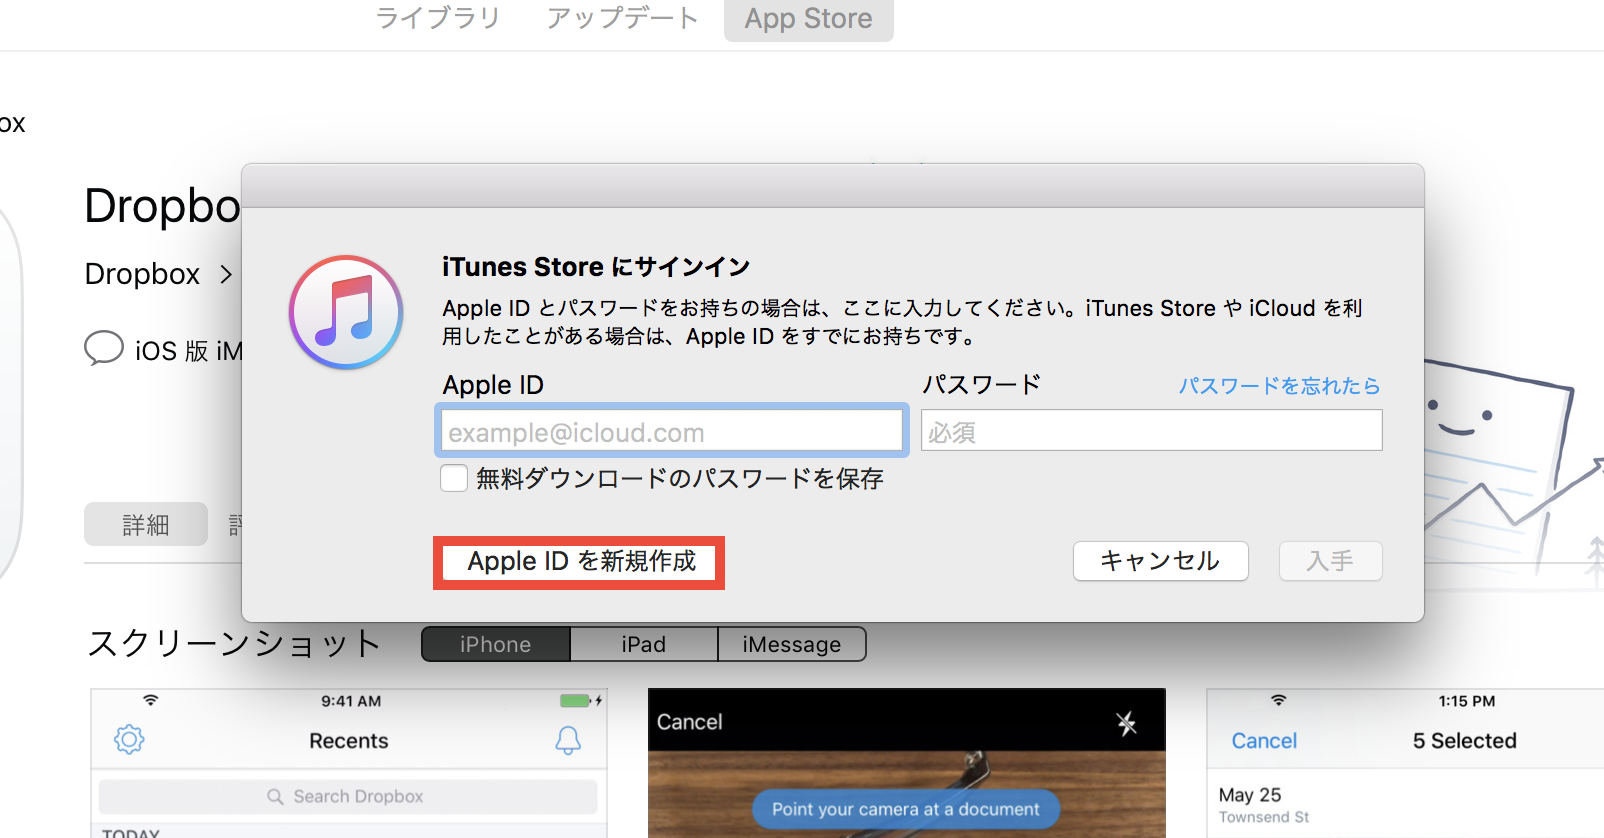 Apple IDの新規取得に進む